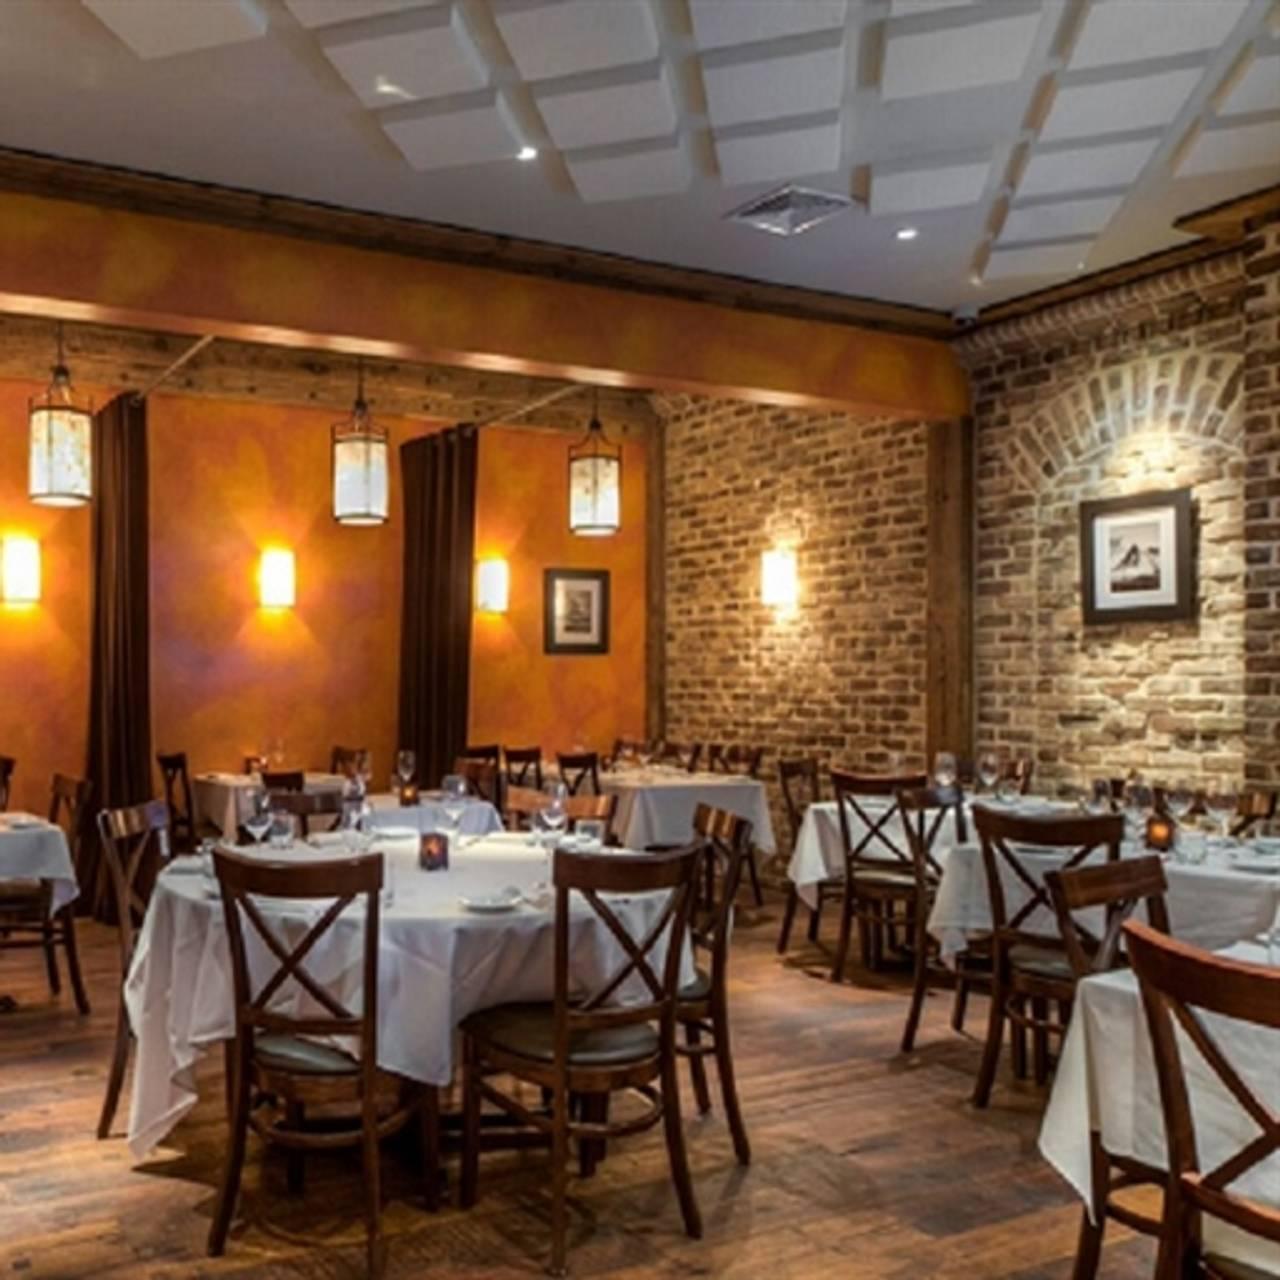 Ombra Cucina Italiana Hilton Head Island Sc